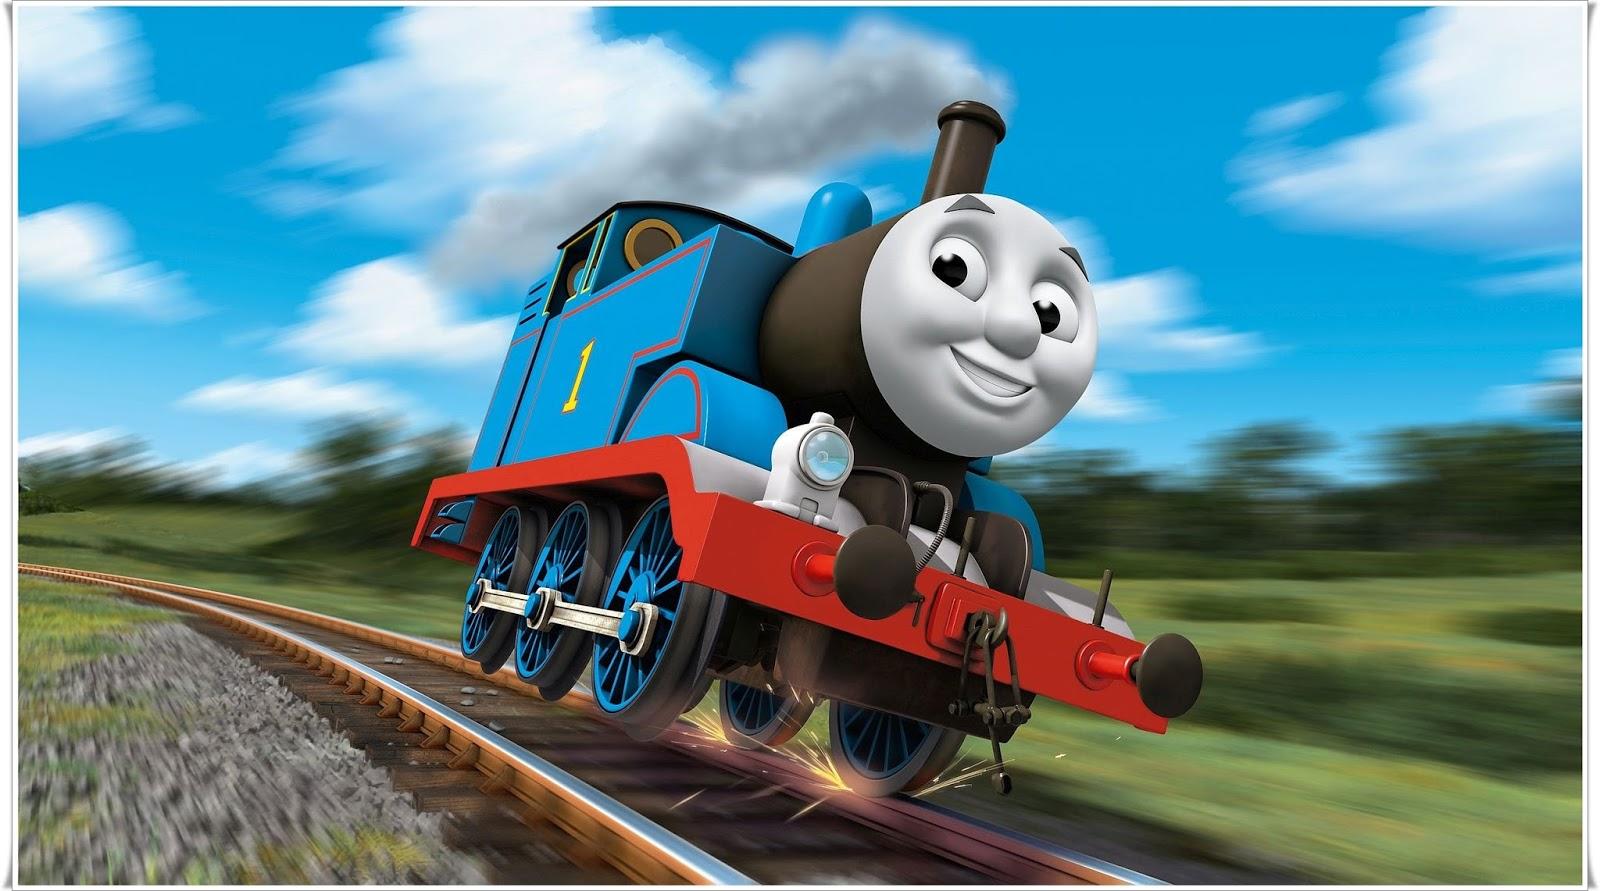 Kumpulan Gambar Kartun Kereta Api Gokil Abis